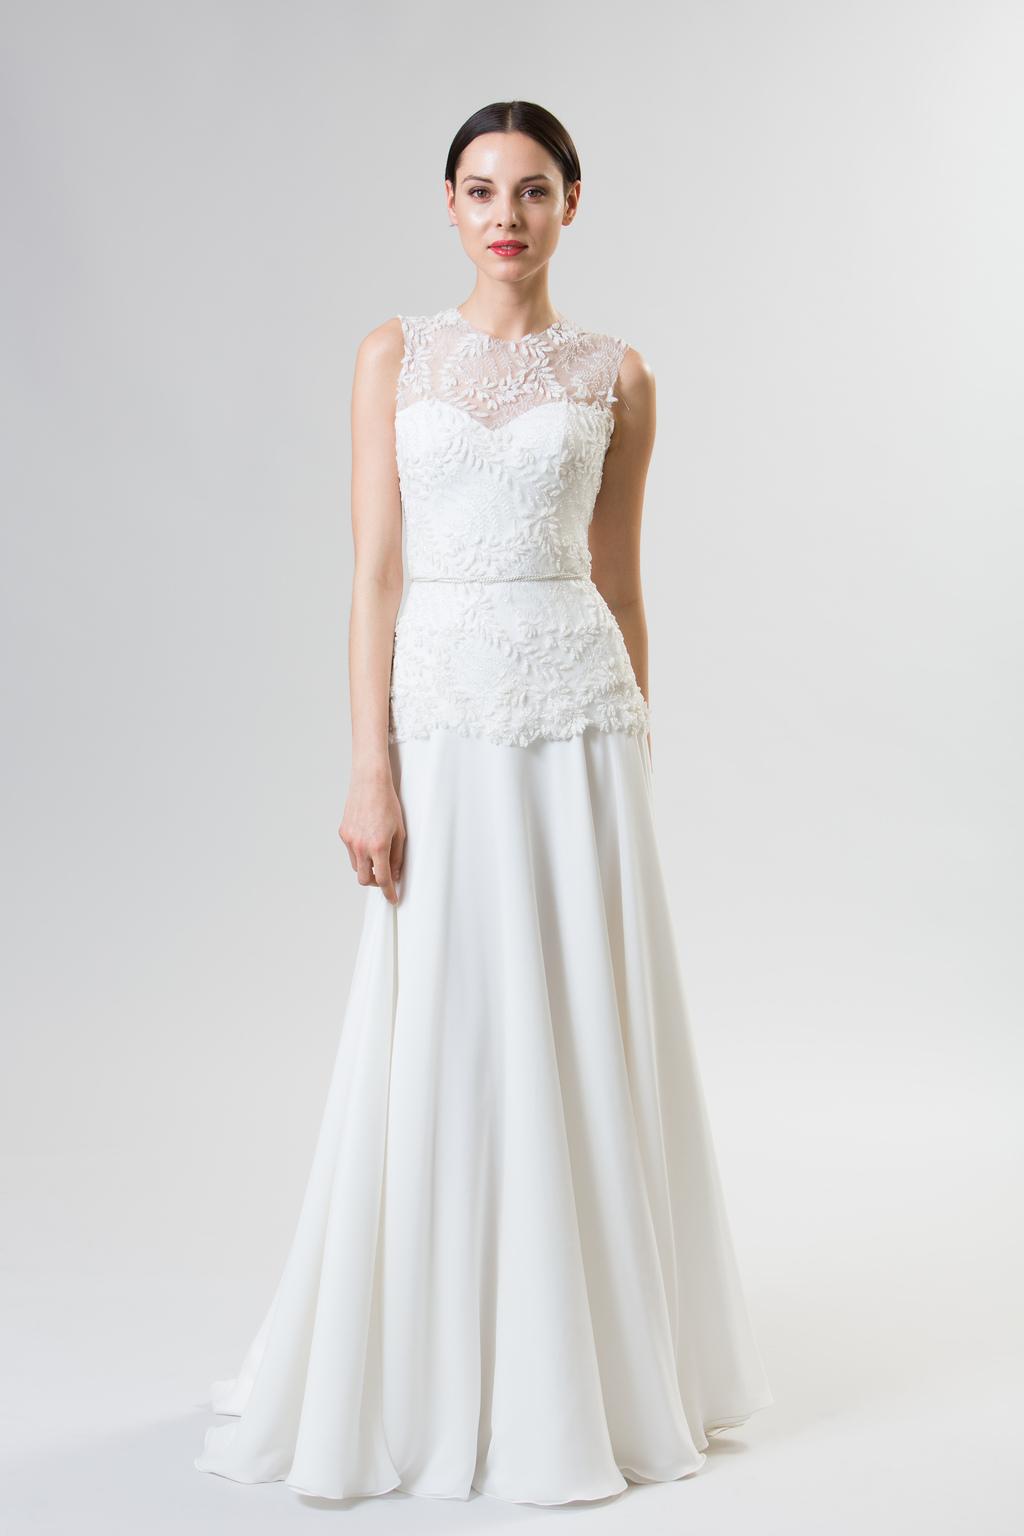 Junko-yoshioka-summer-spring-2014-wedding-dress-macaroon_1.full